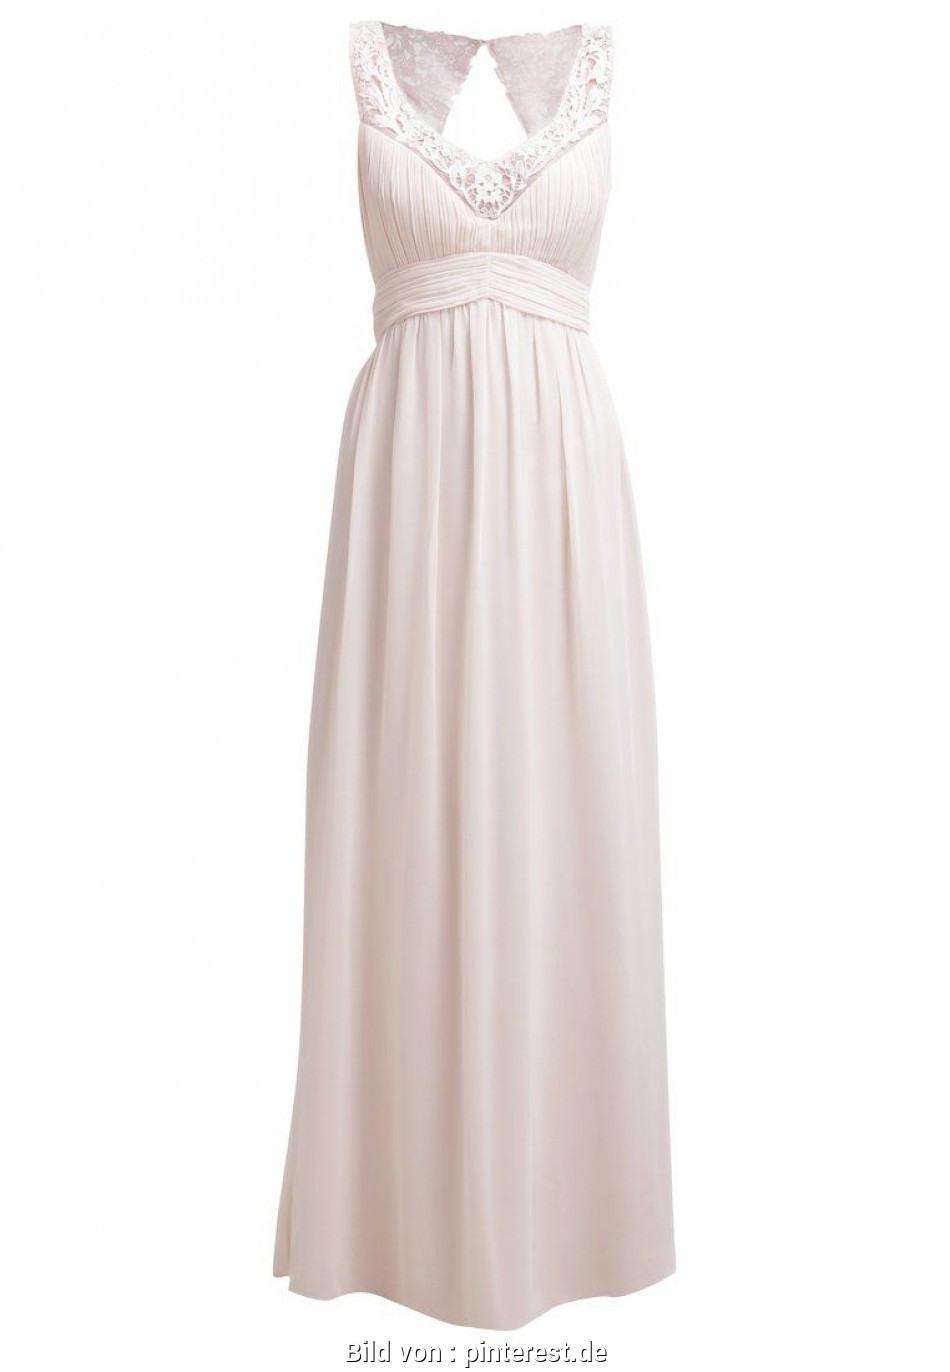 10 Elegant Abendkleider Wuppertal Ärmel - Abendkleid